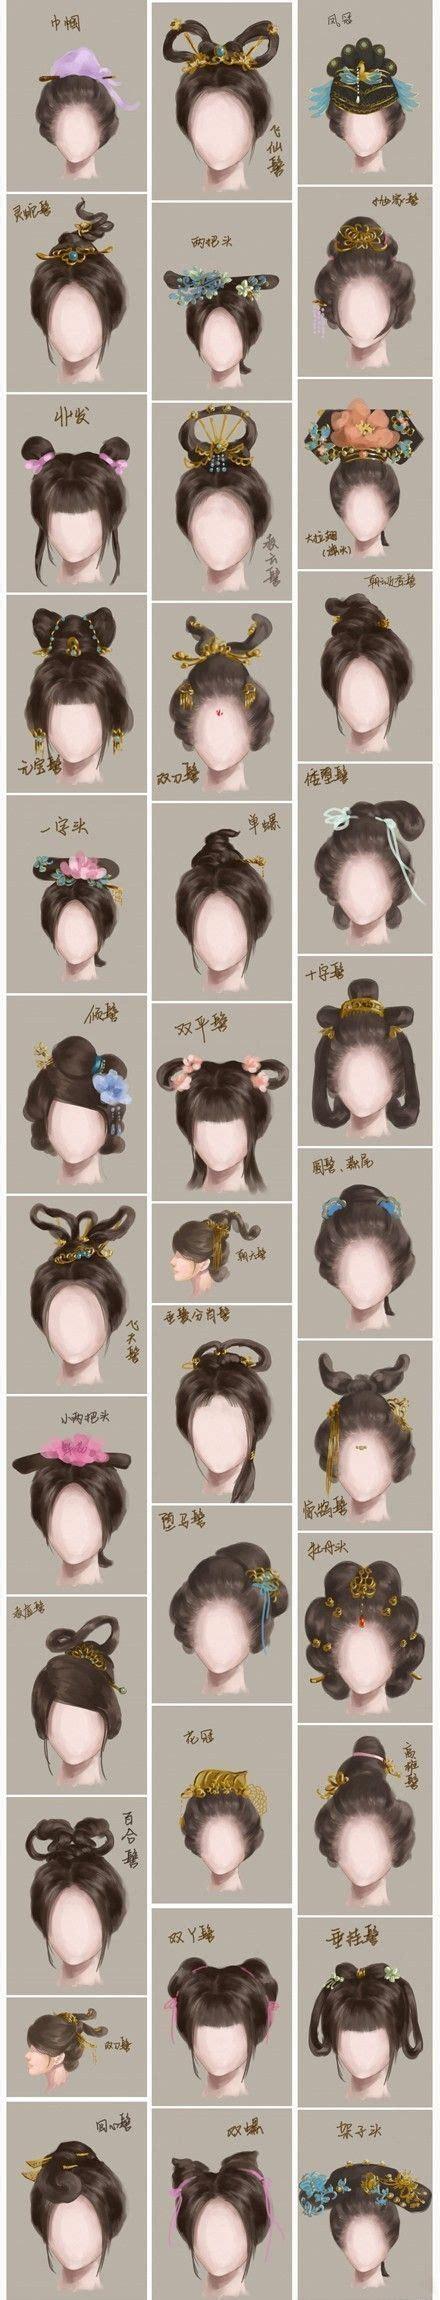 hairstyles history timeline 古代发髻